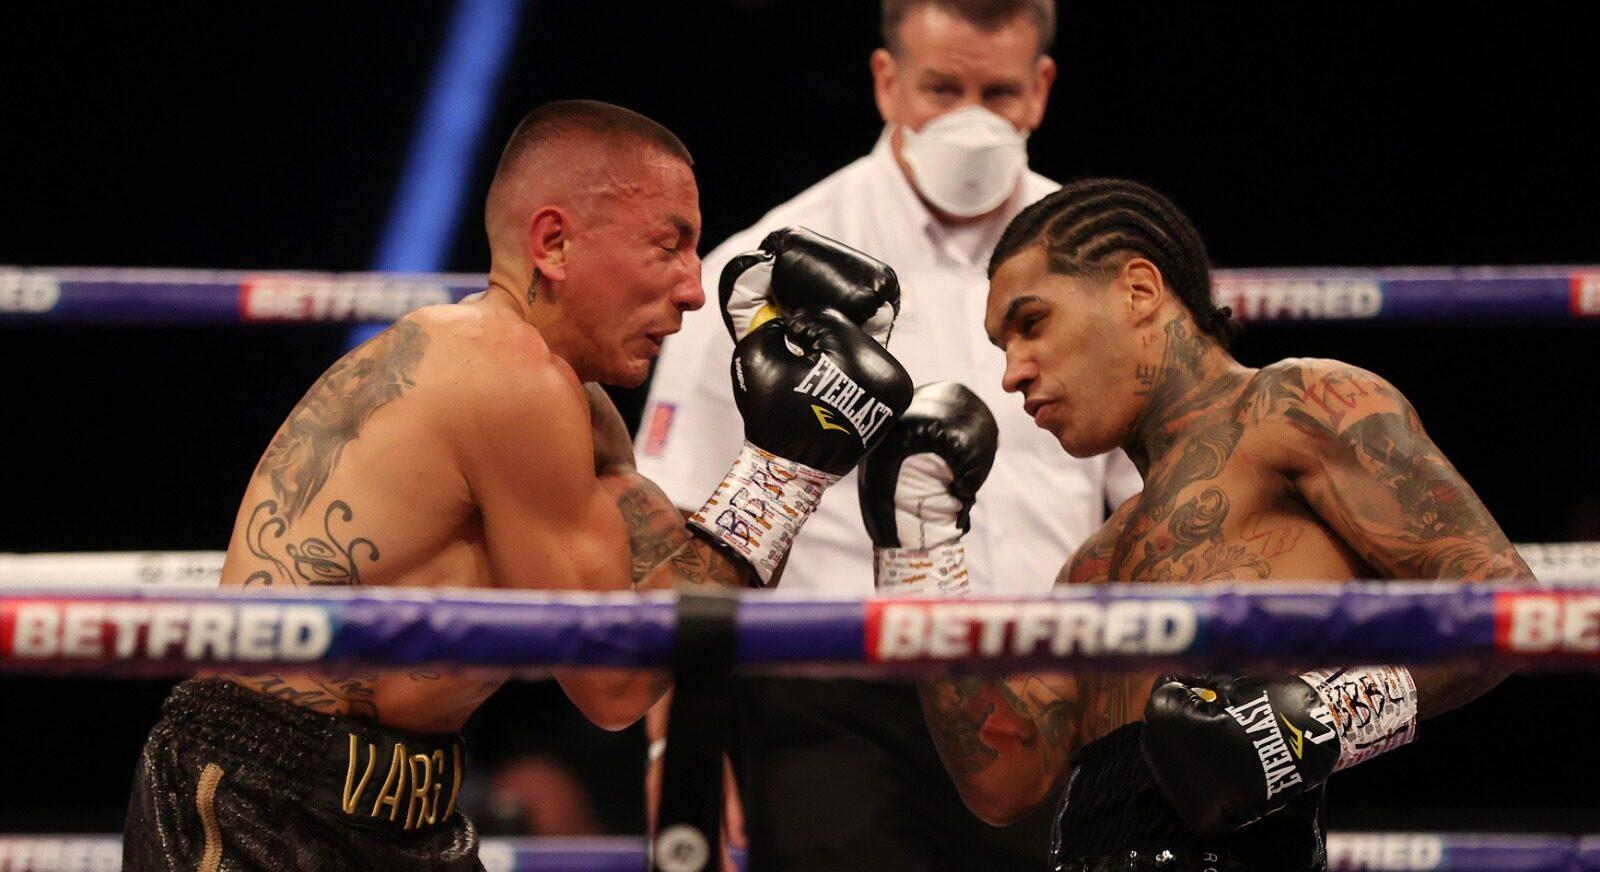 Conor Benn vs. Samuel Vargas Full Fight Card Report From London | Boxen247.com